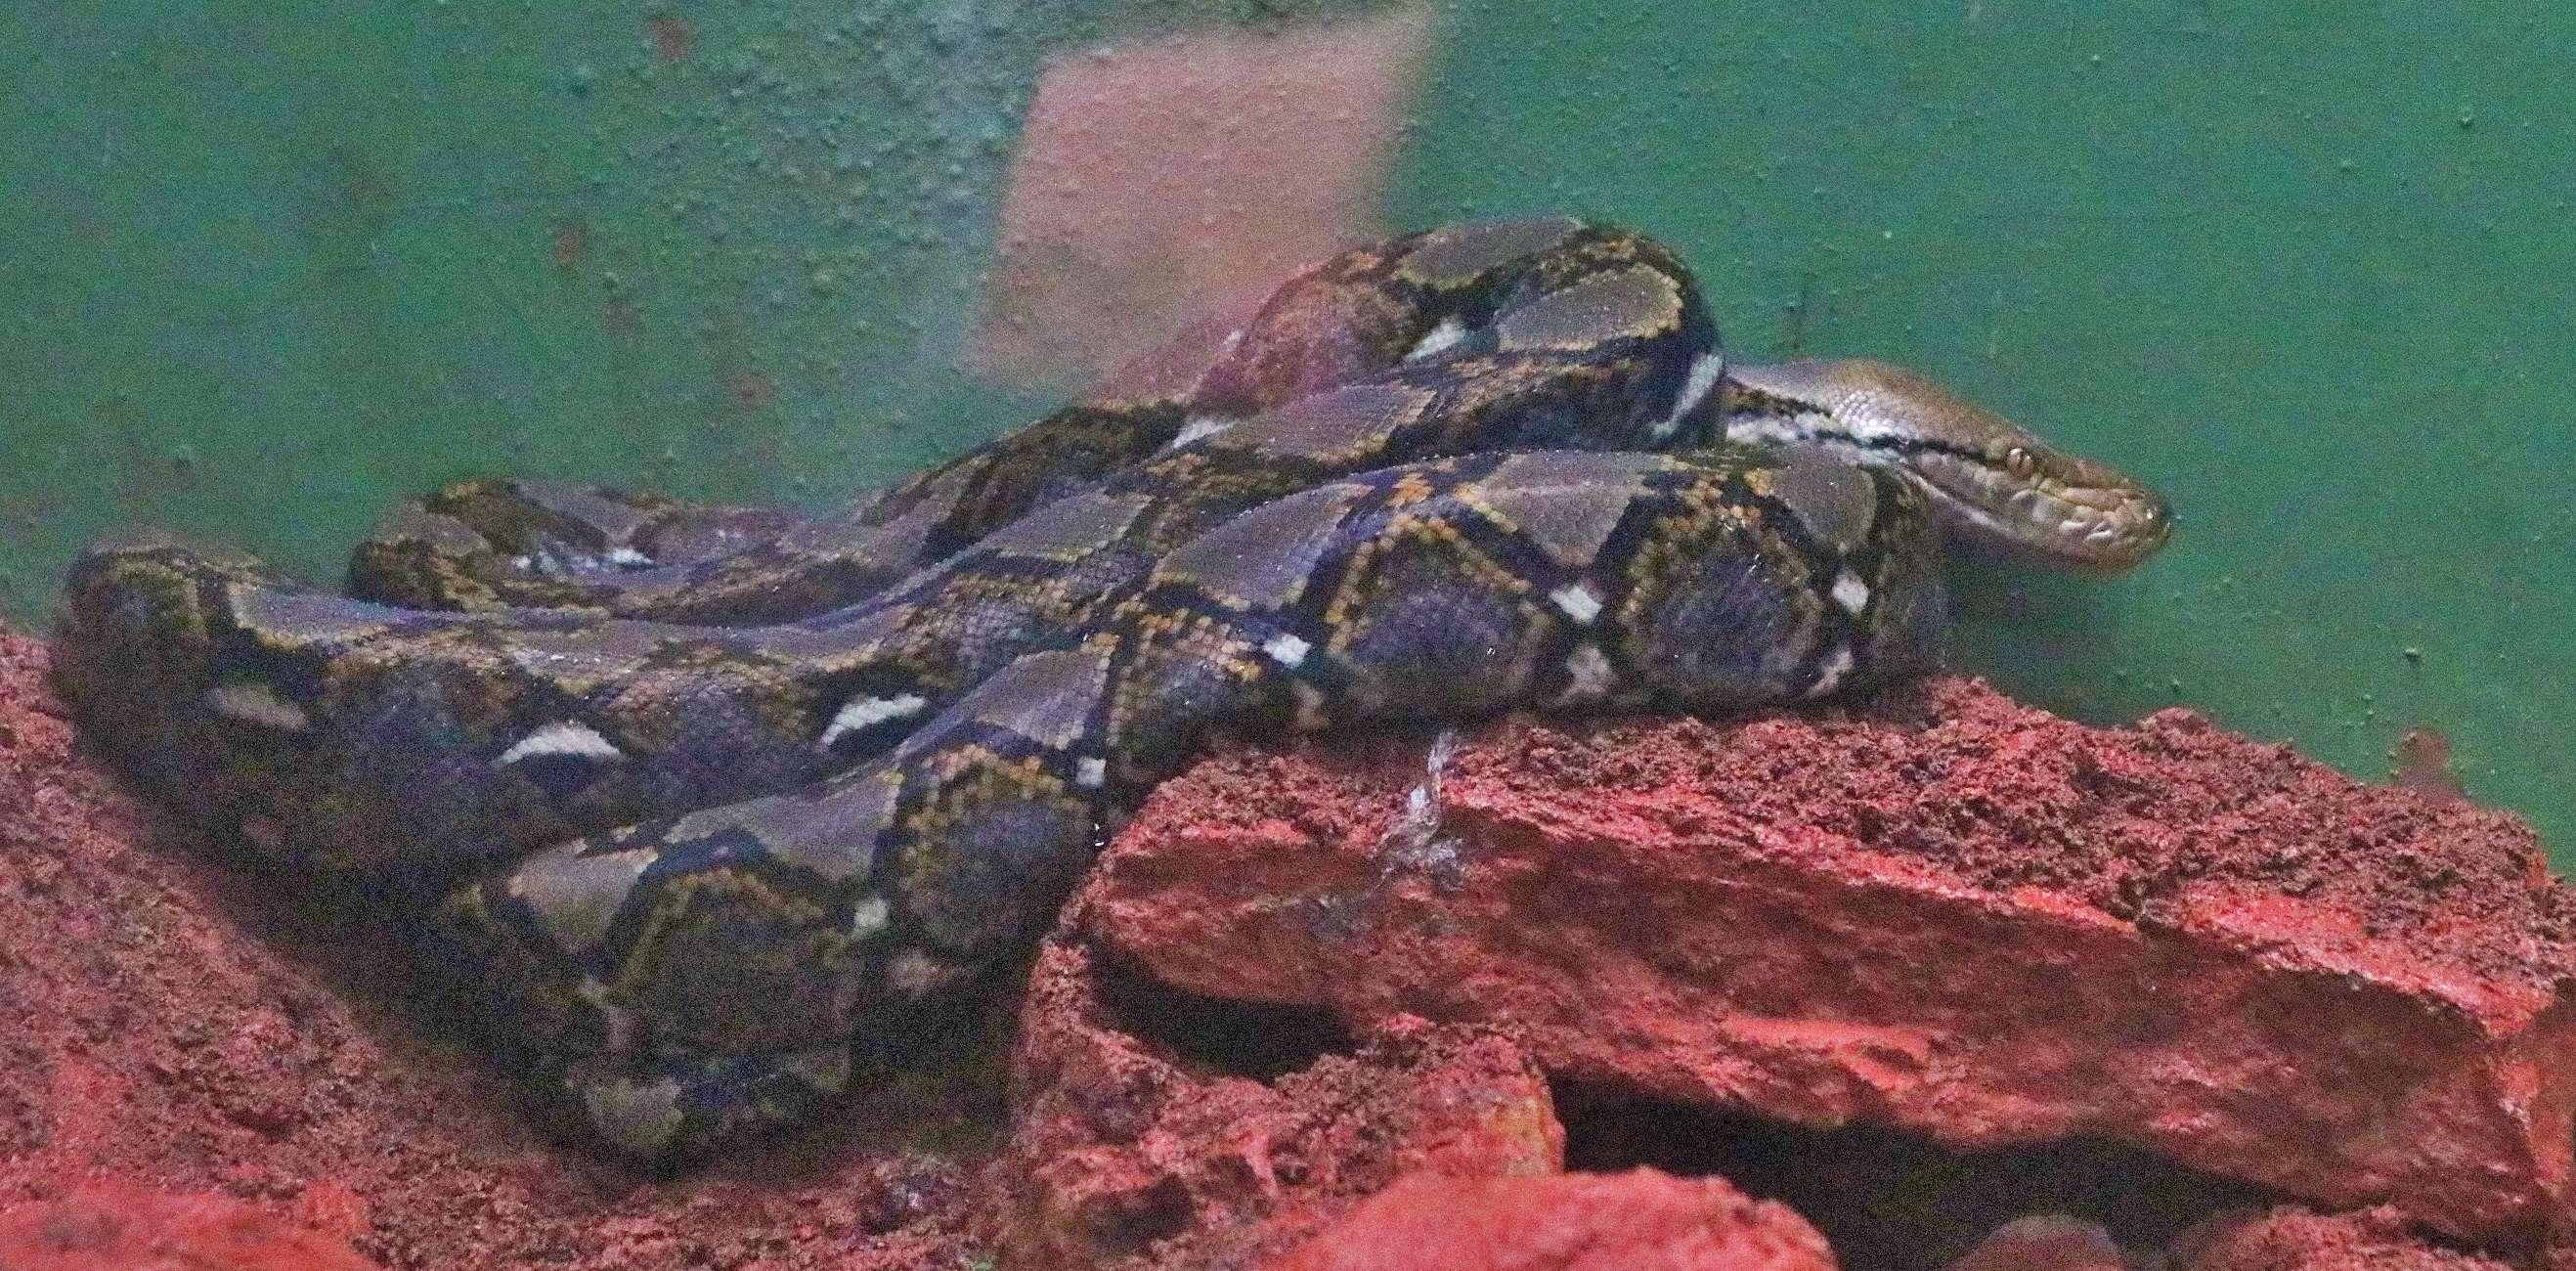 A python inside the reptile enclosure - Copy